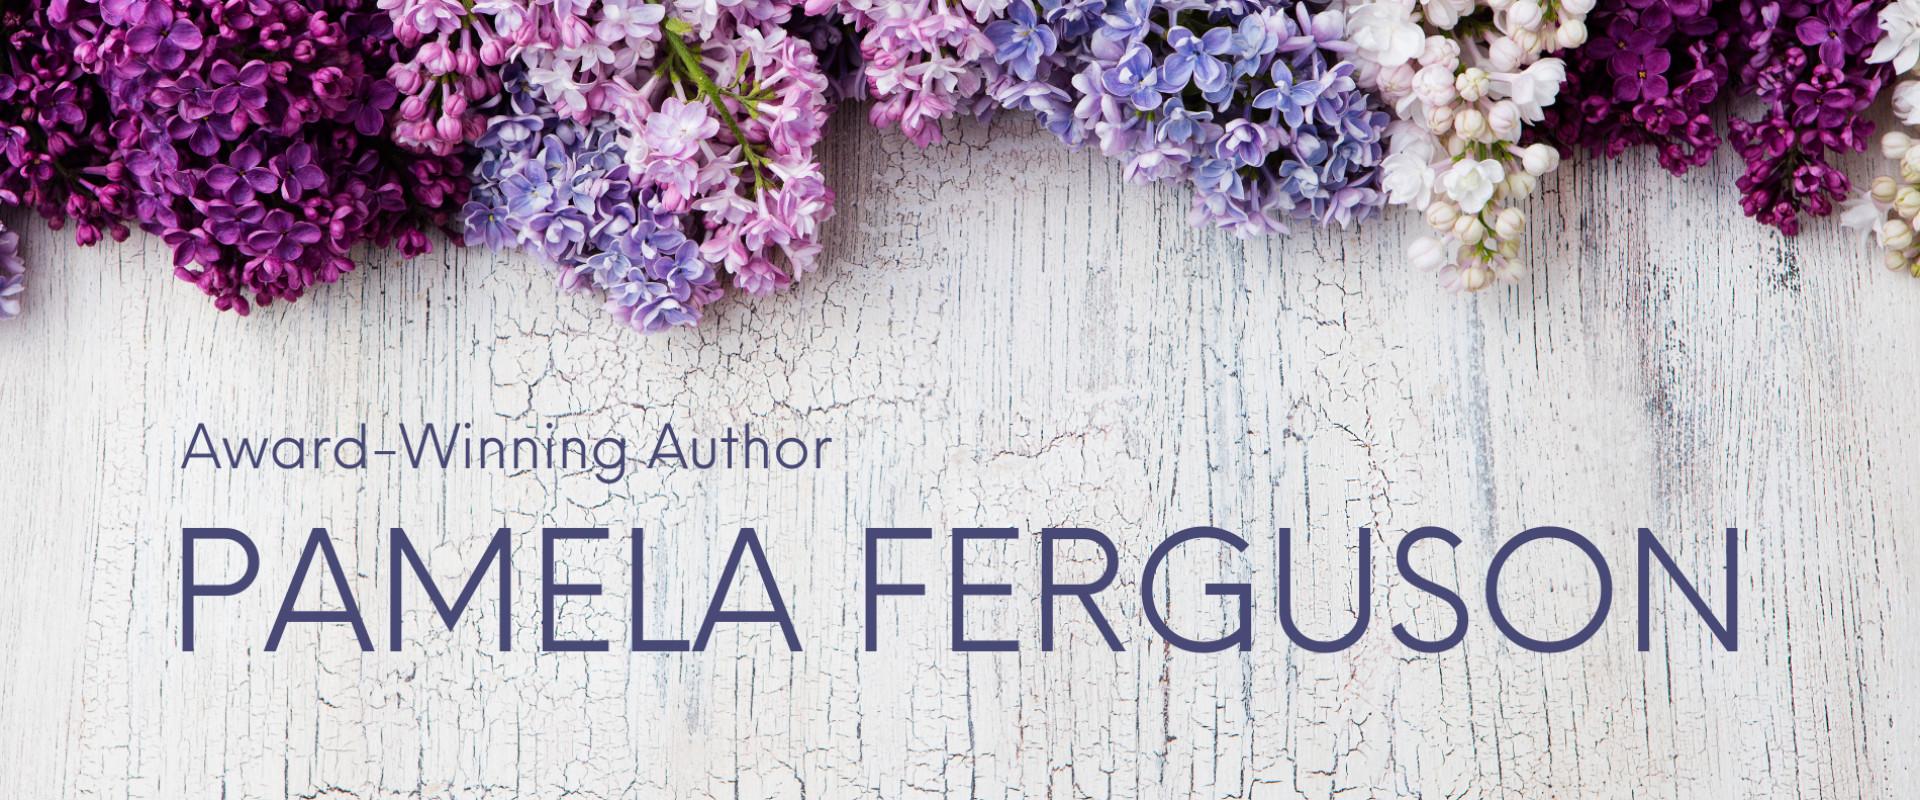 Pamela Ferguson